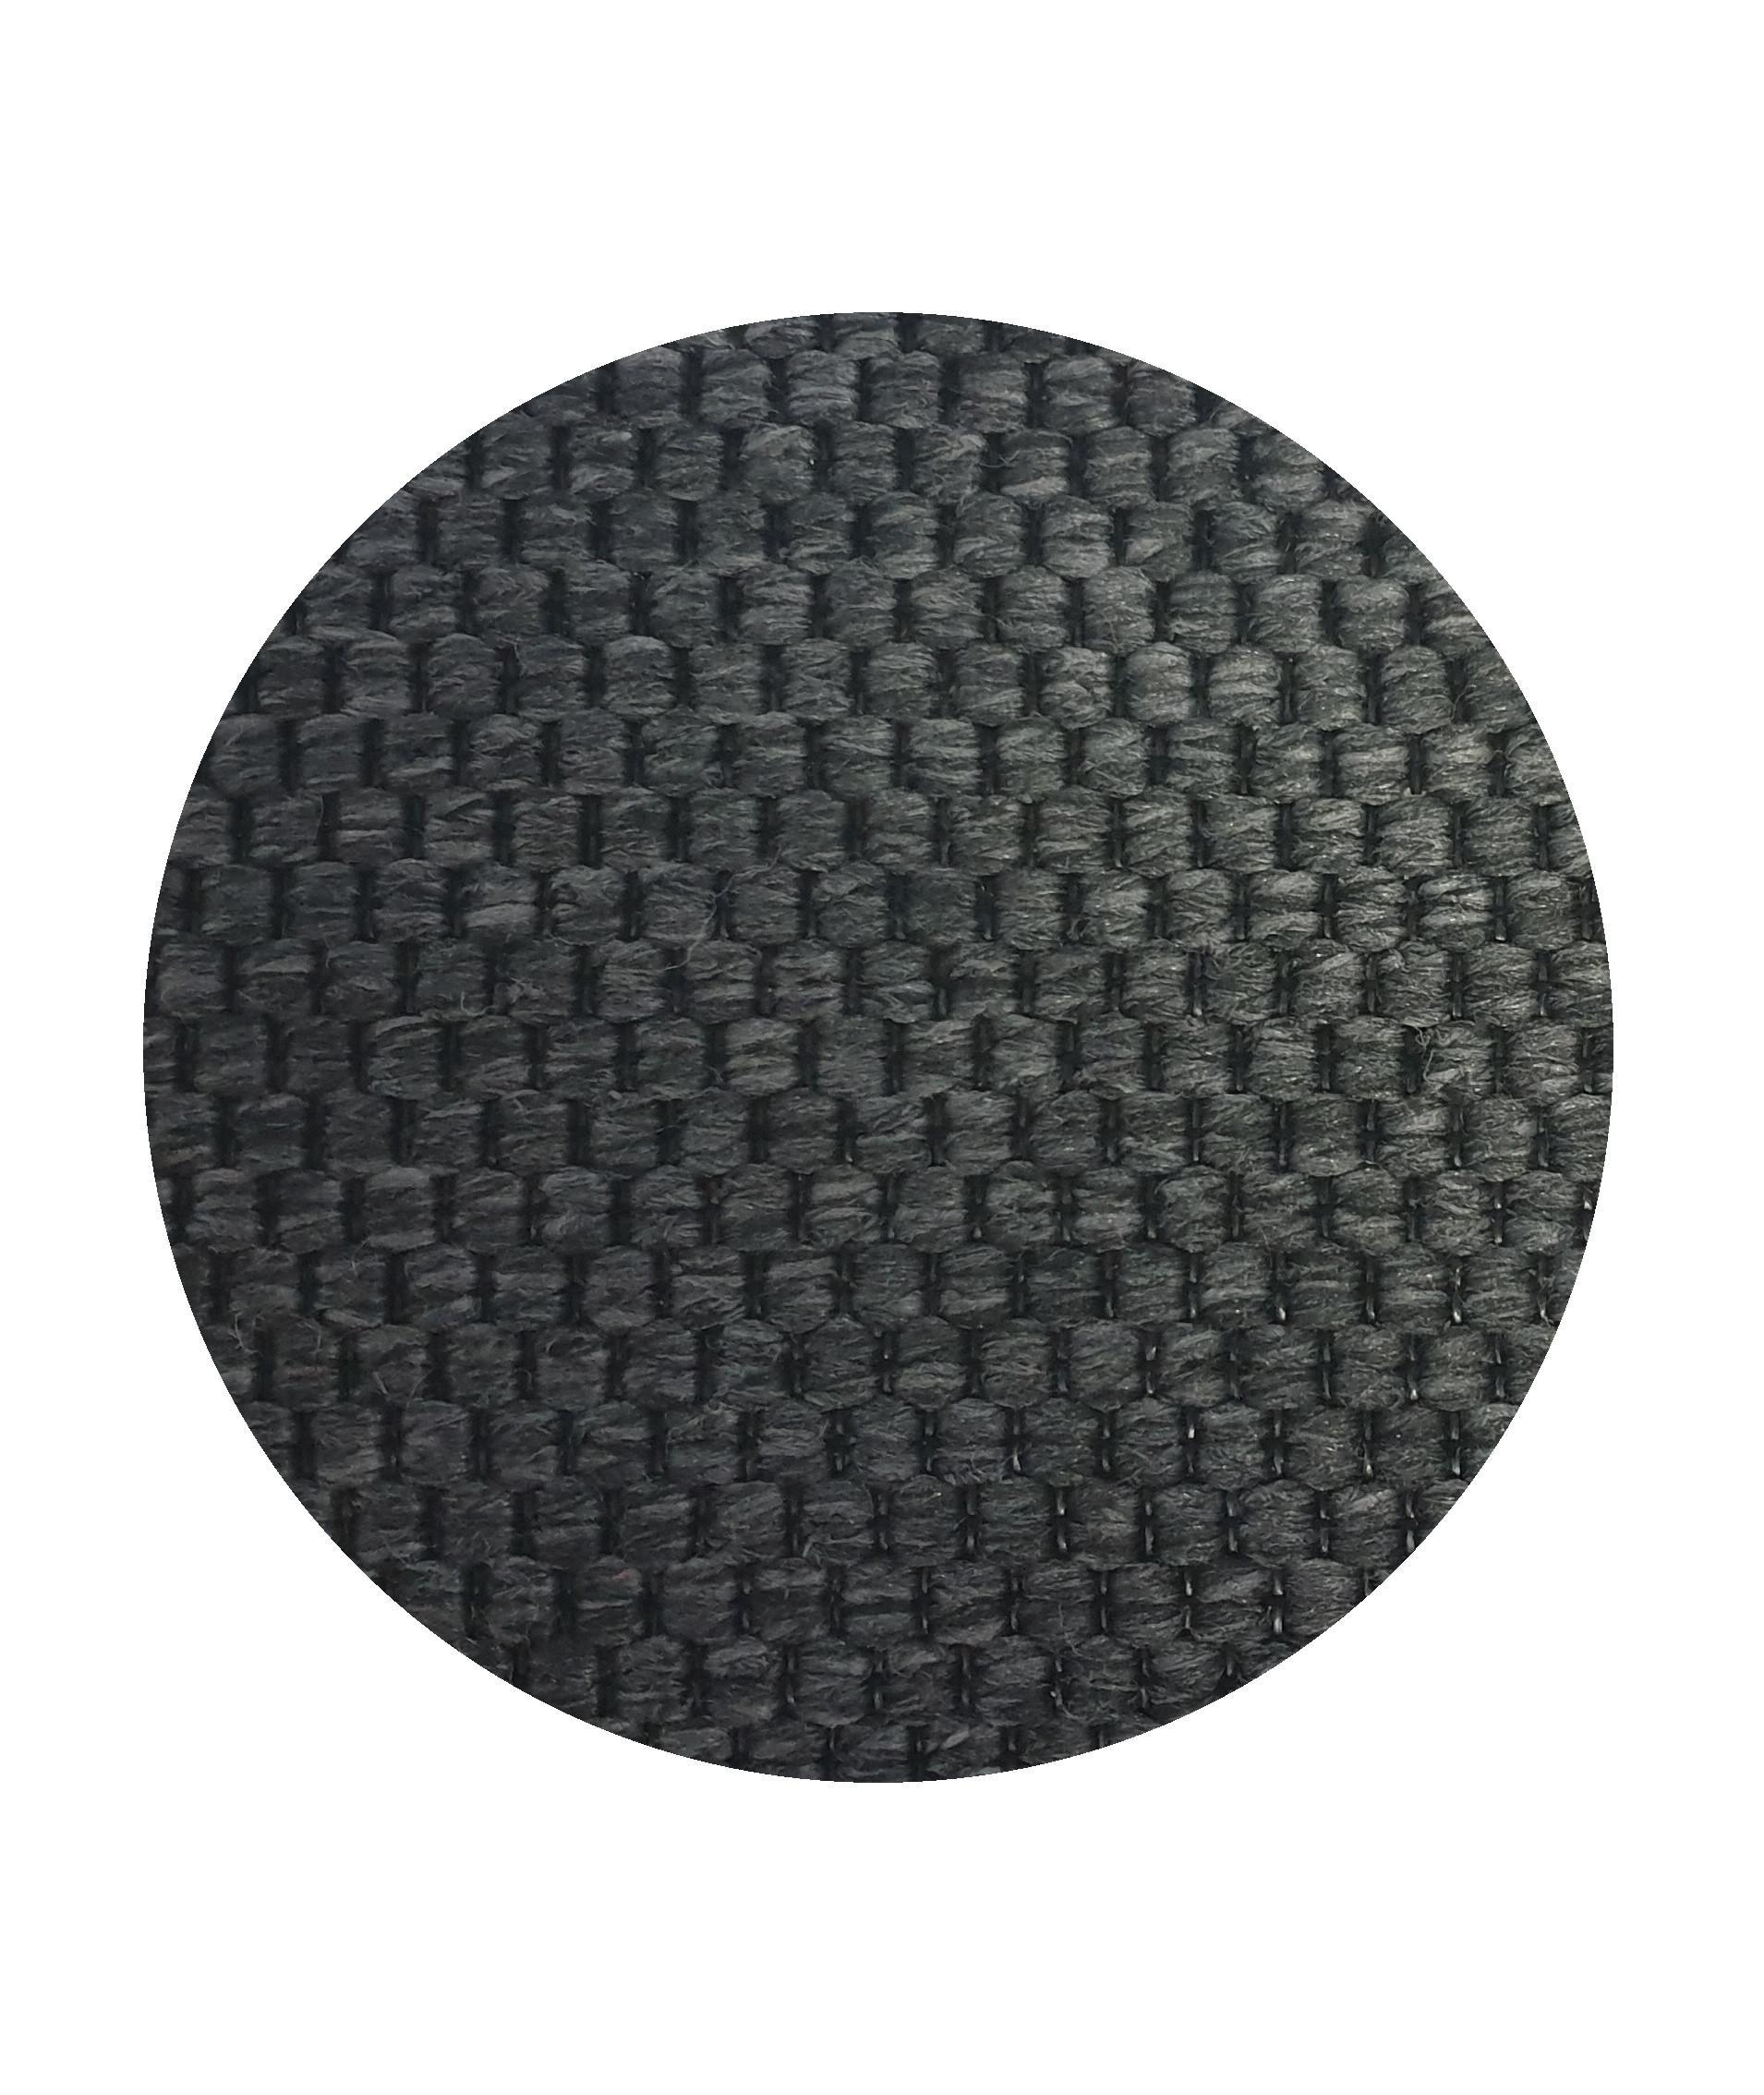 Vopi koberce Kusový koberec Nature antracit kulatý - 57x57 (průměr) kruh cm